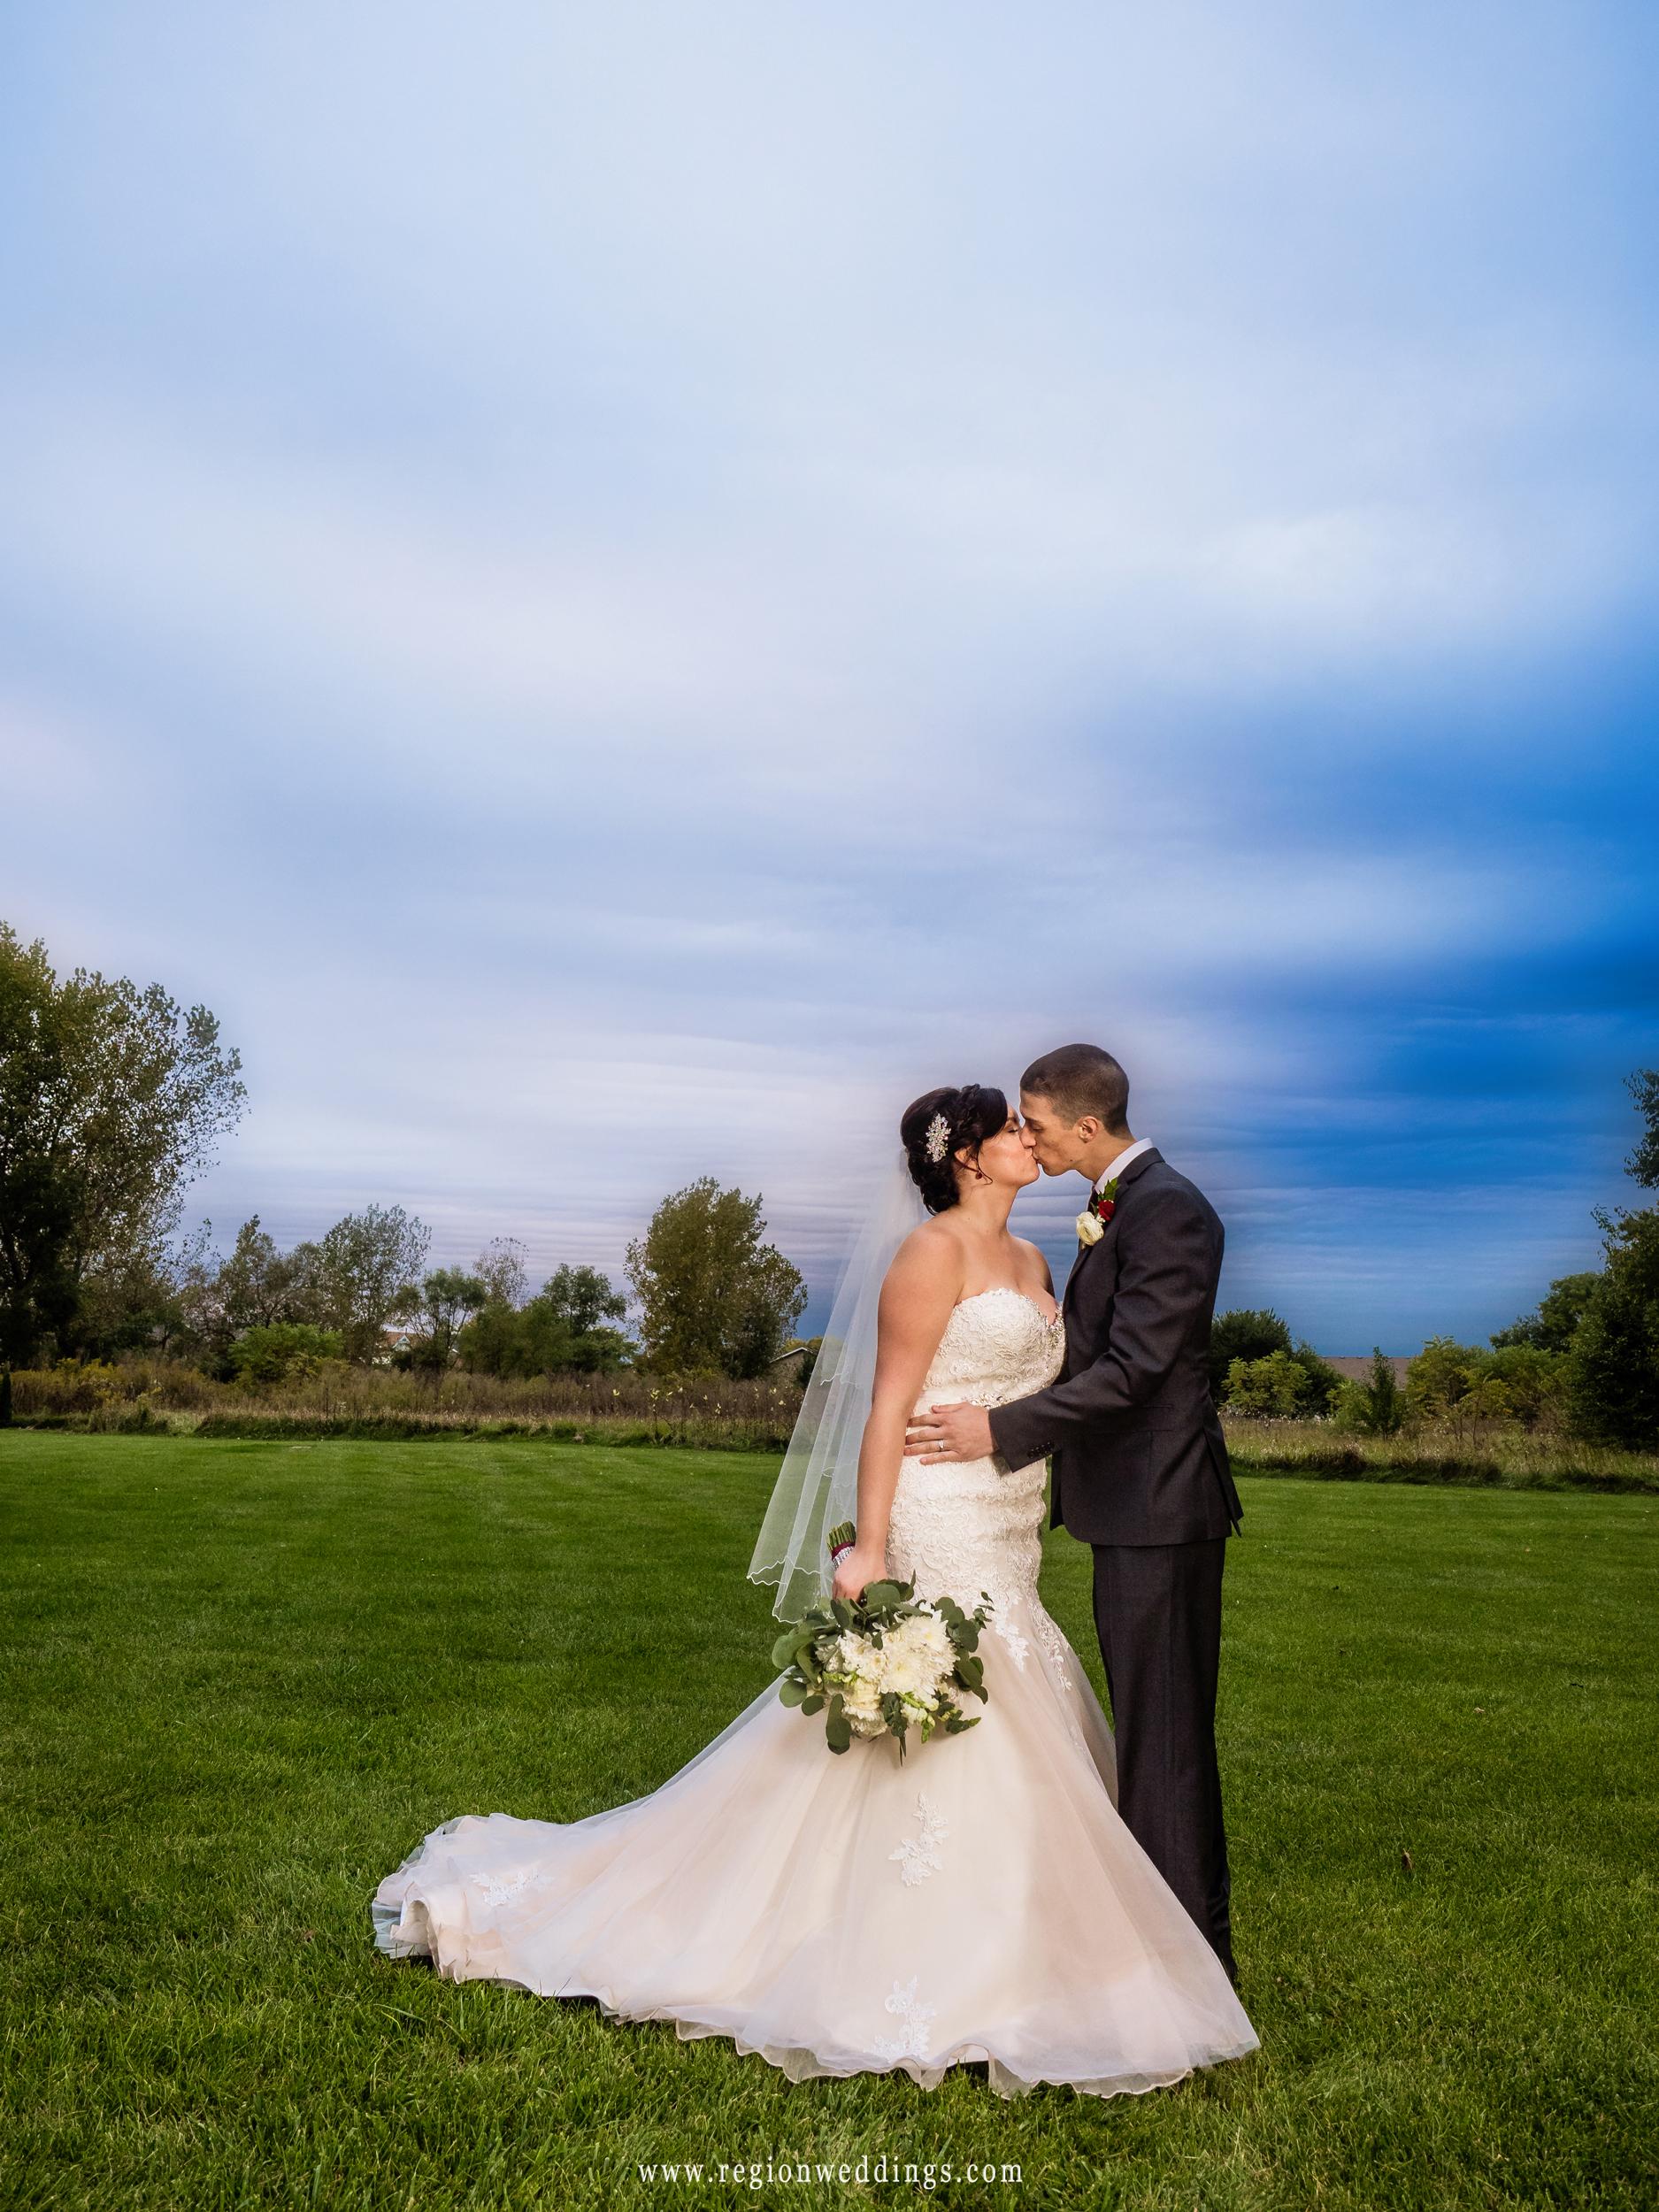 Bride and groom kiss beneath a blue sky.